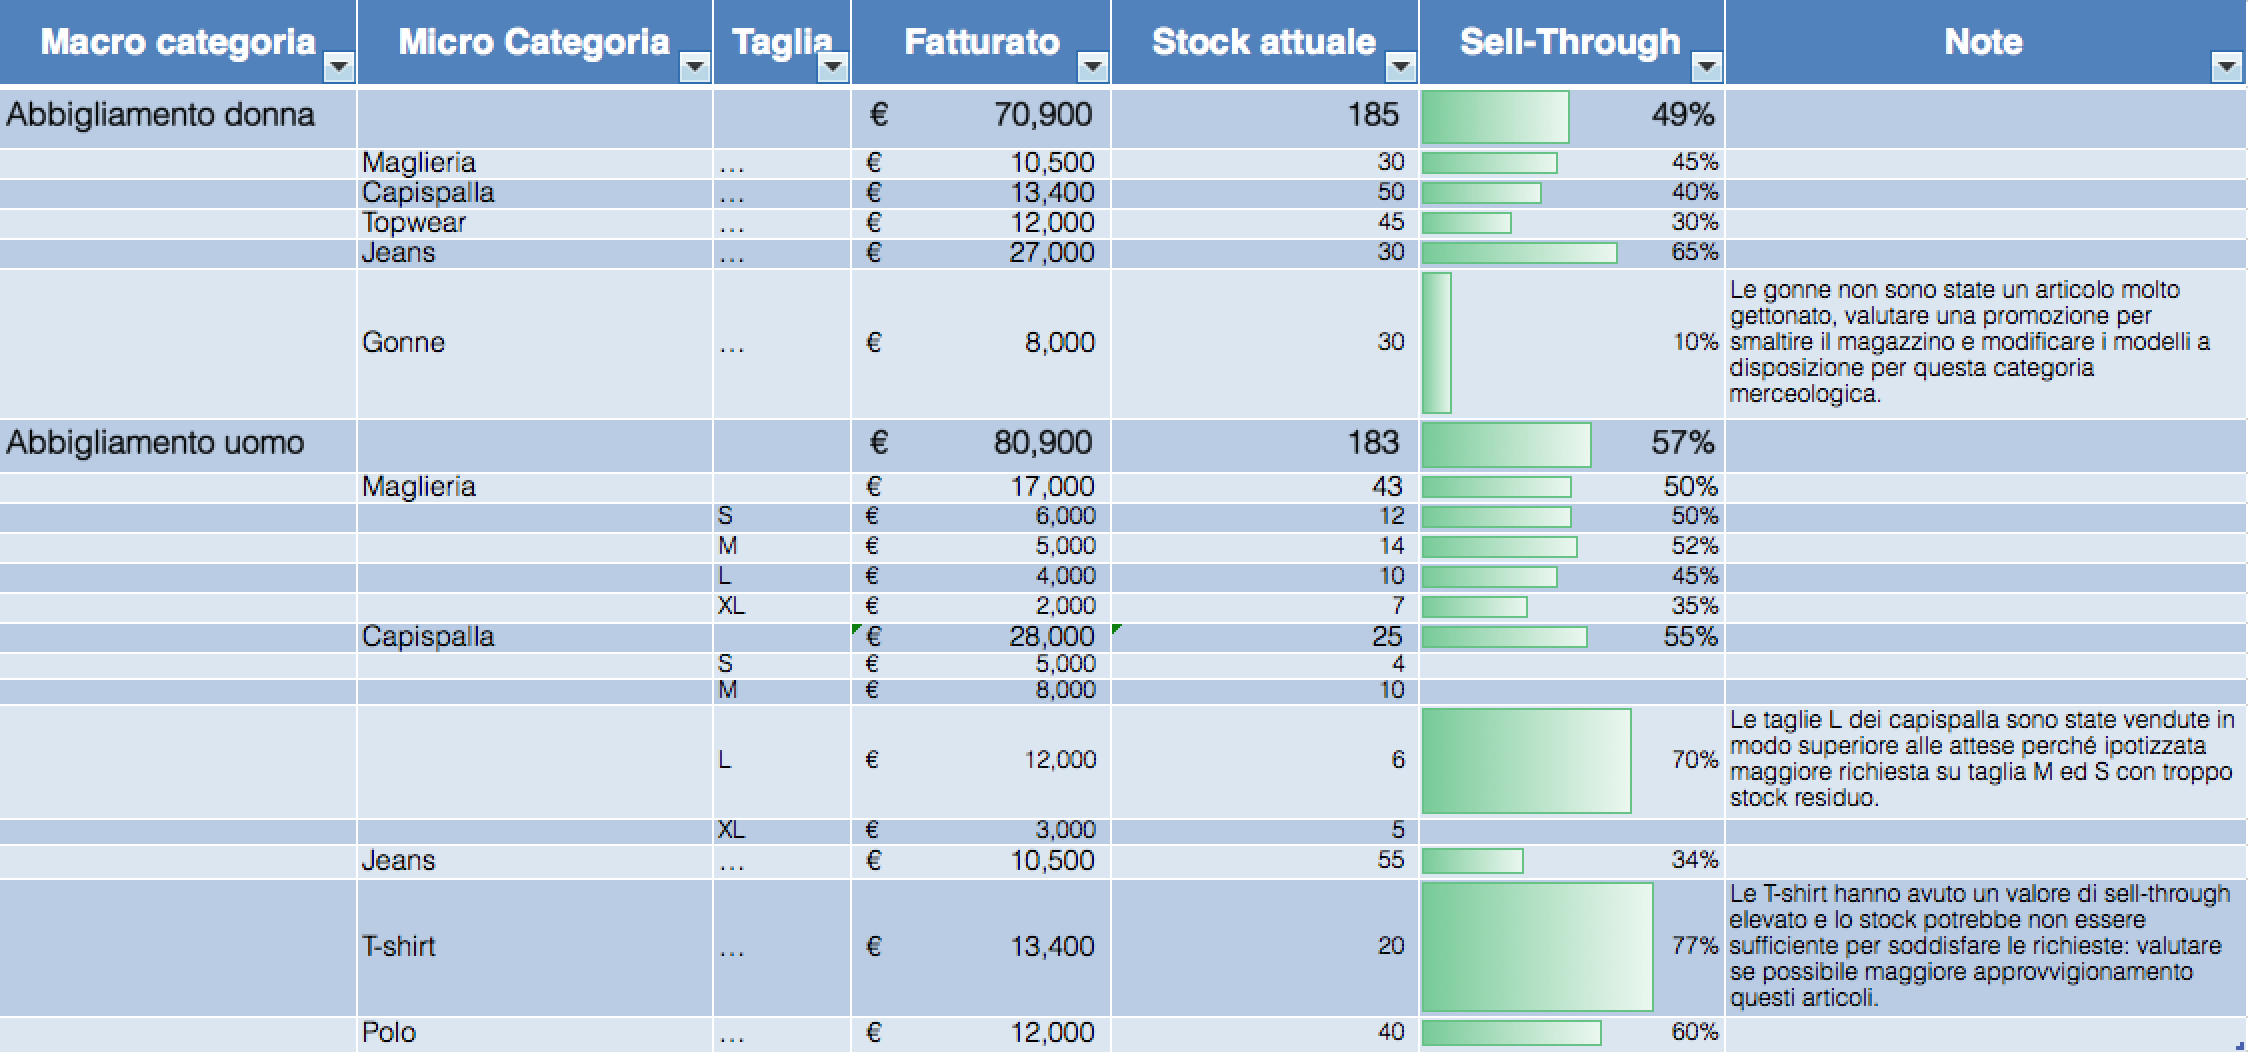 tabella-sell-through-categoria